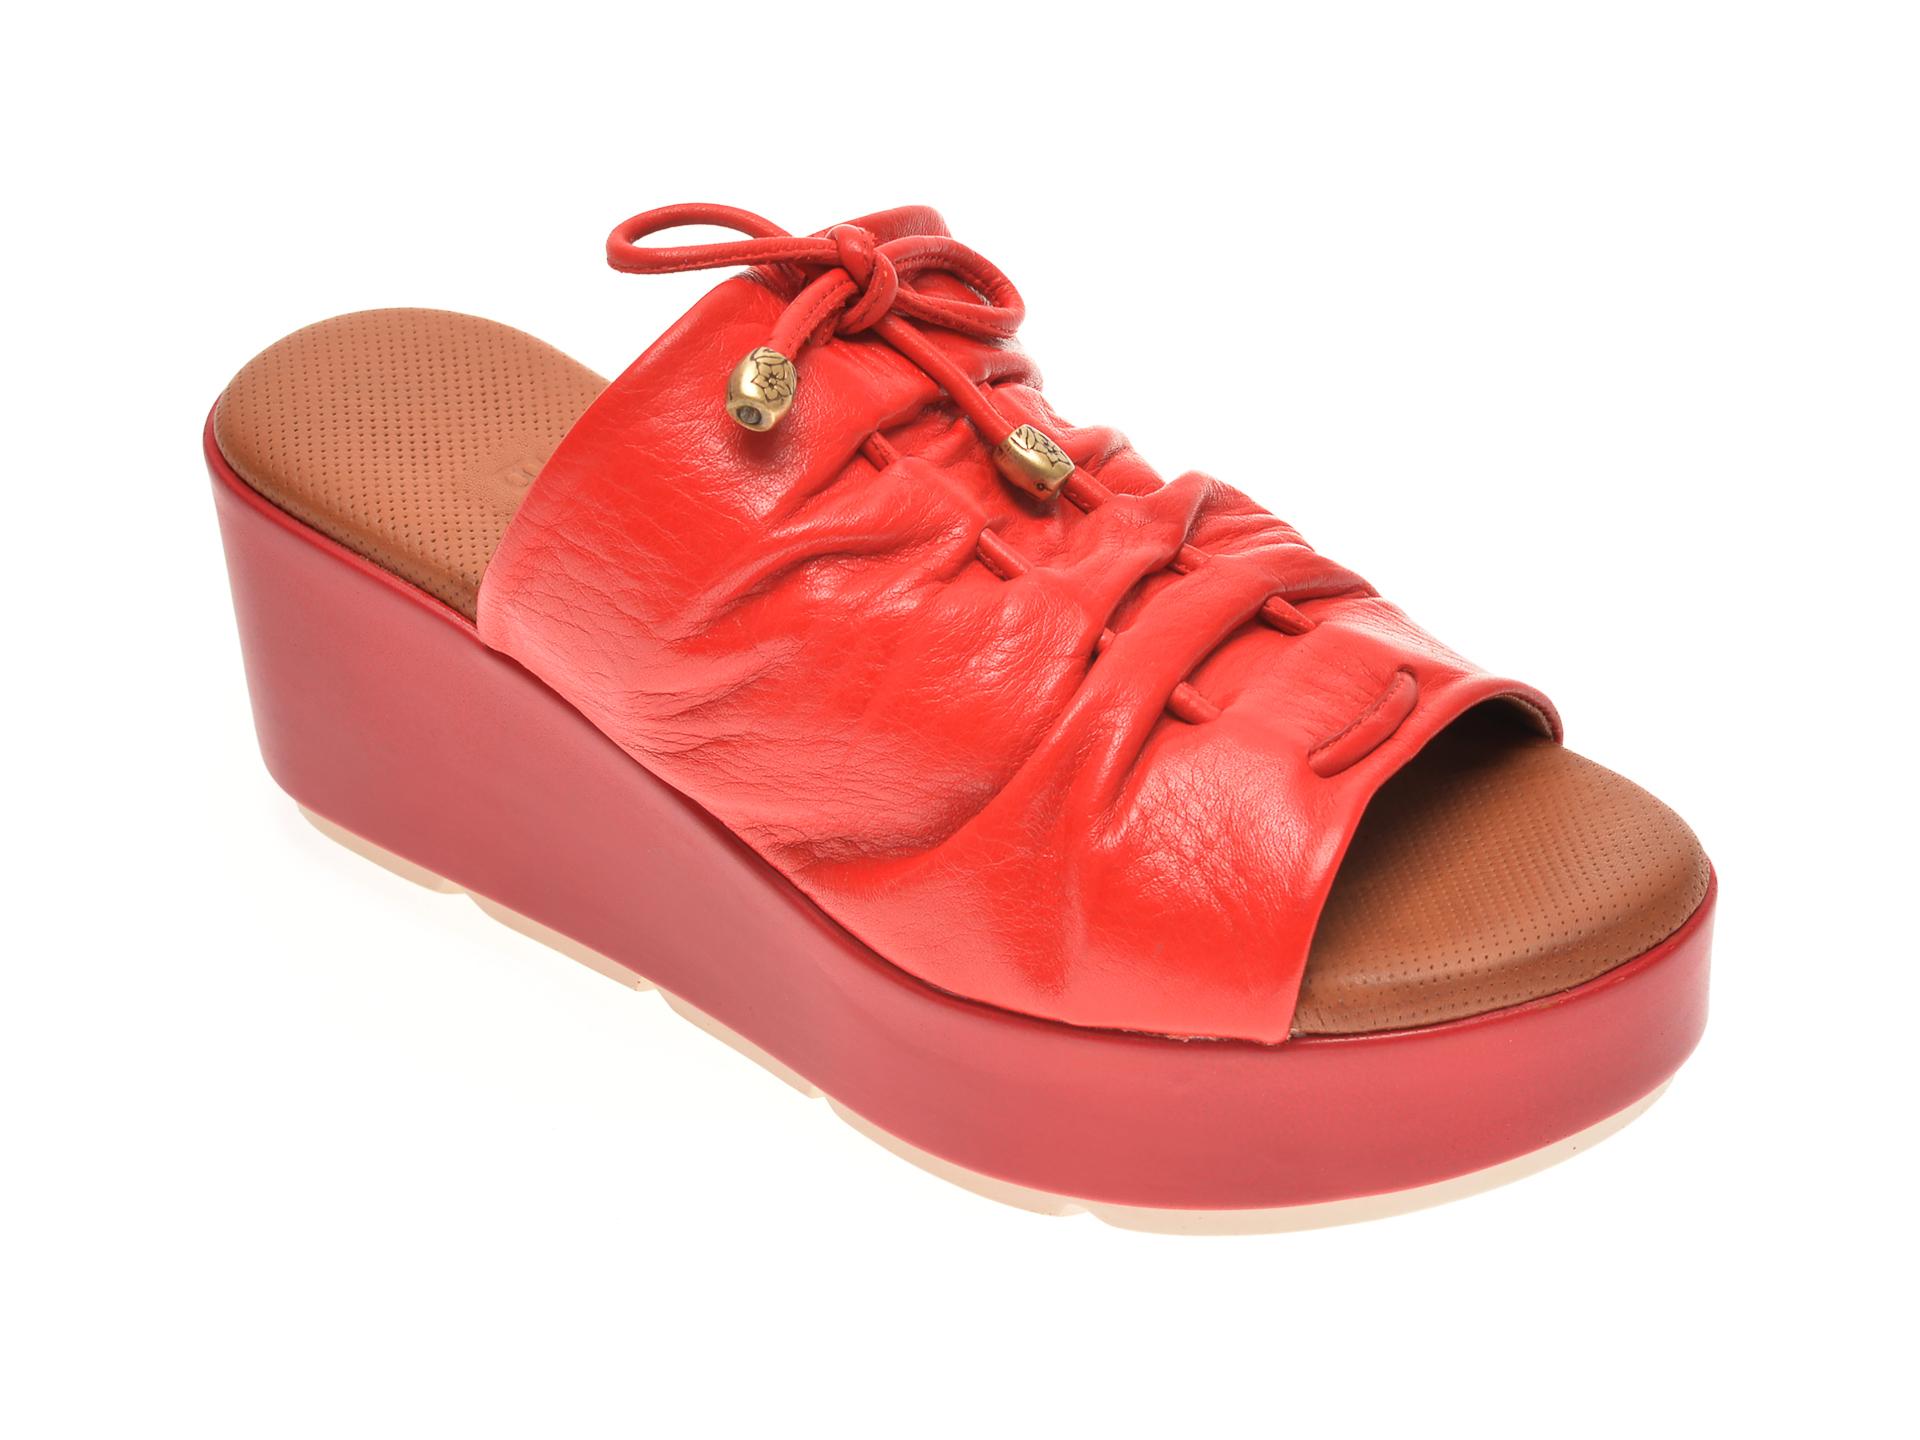 Papuci BABOOS rosii, 2512, din piele naturala